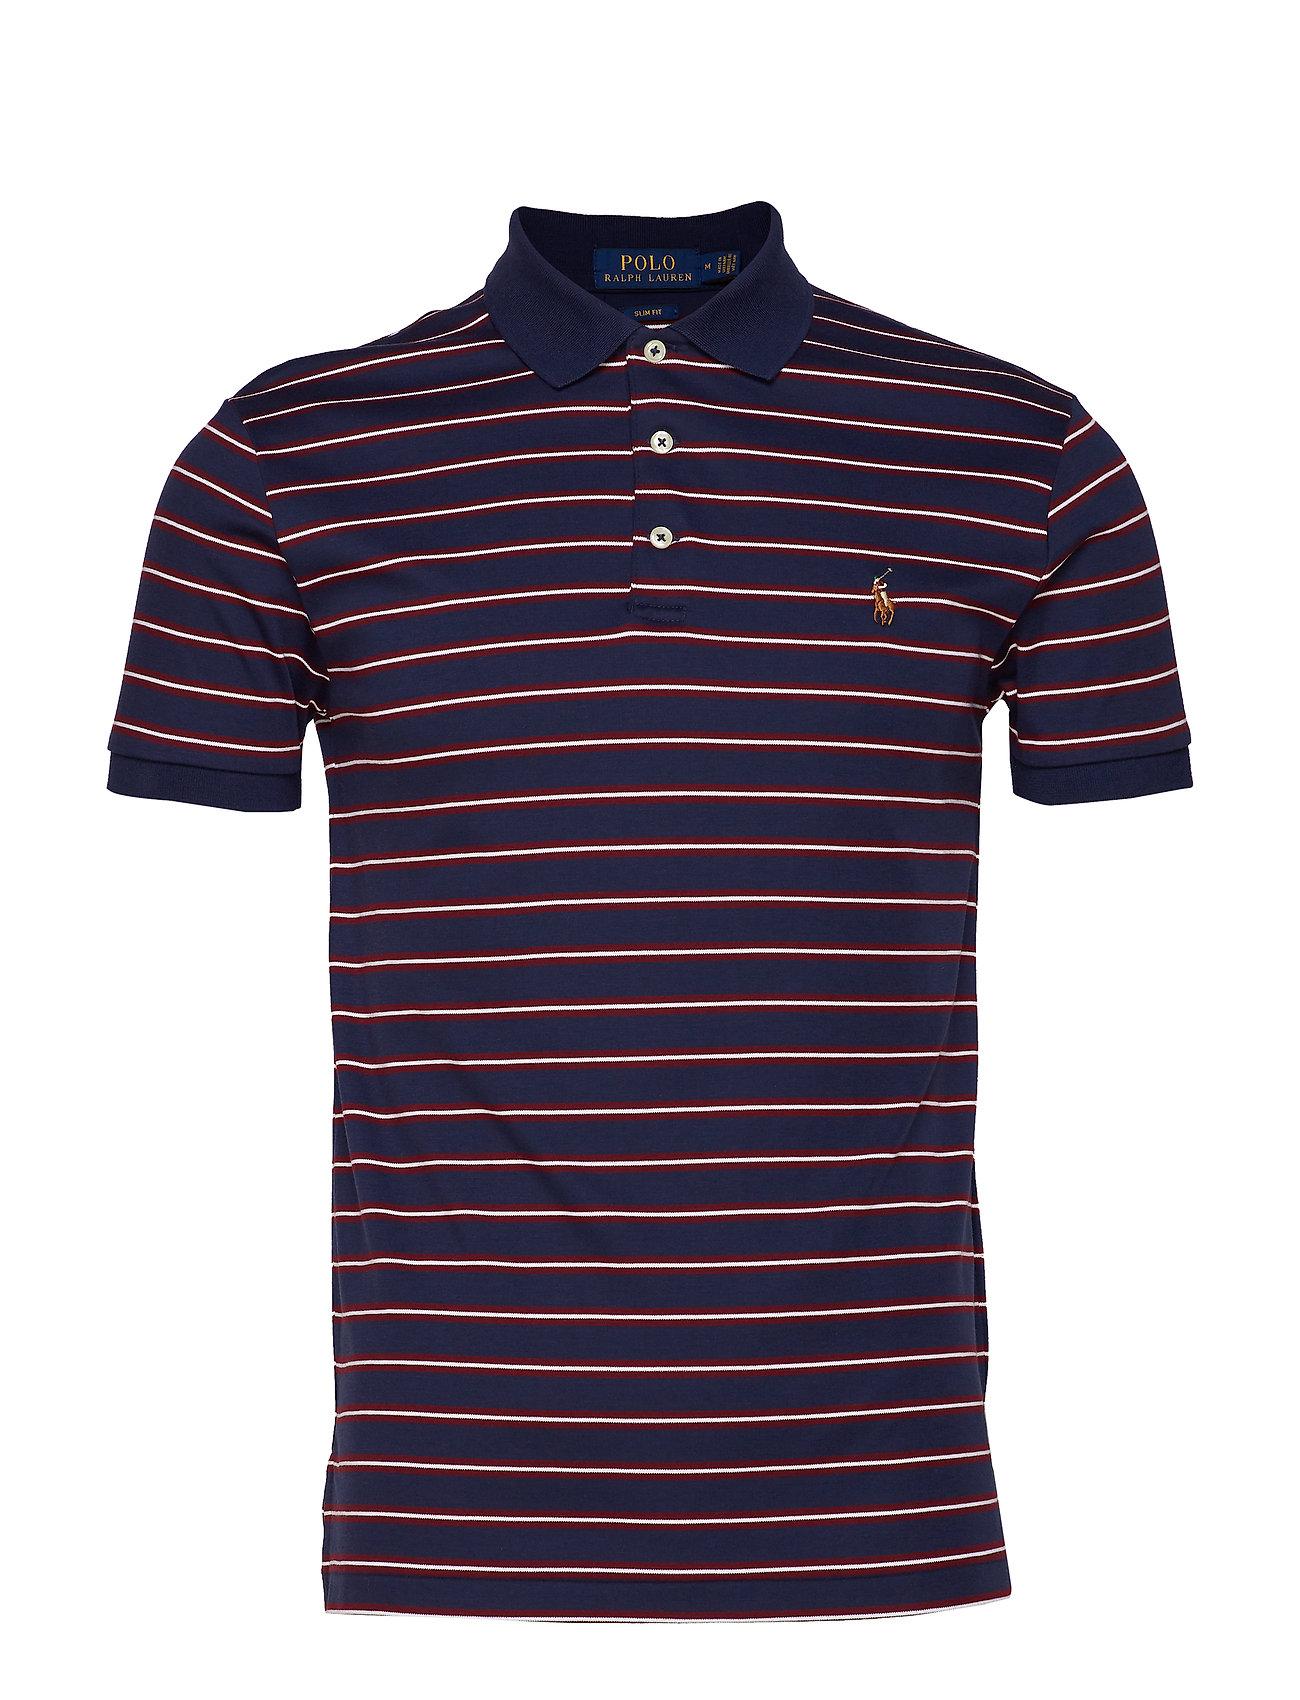 Polo Ralph Lauren Slim Fit Interlock Polo Shirt - FRENCH NAVY MULTI